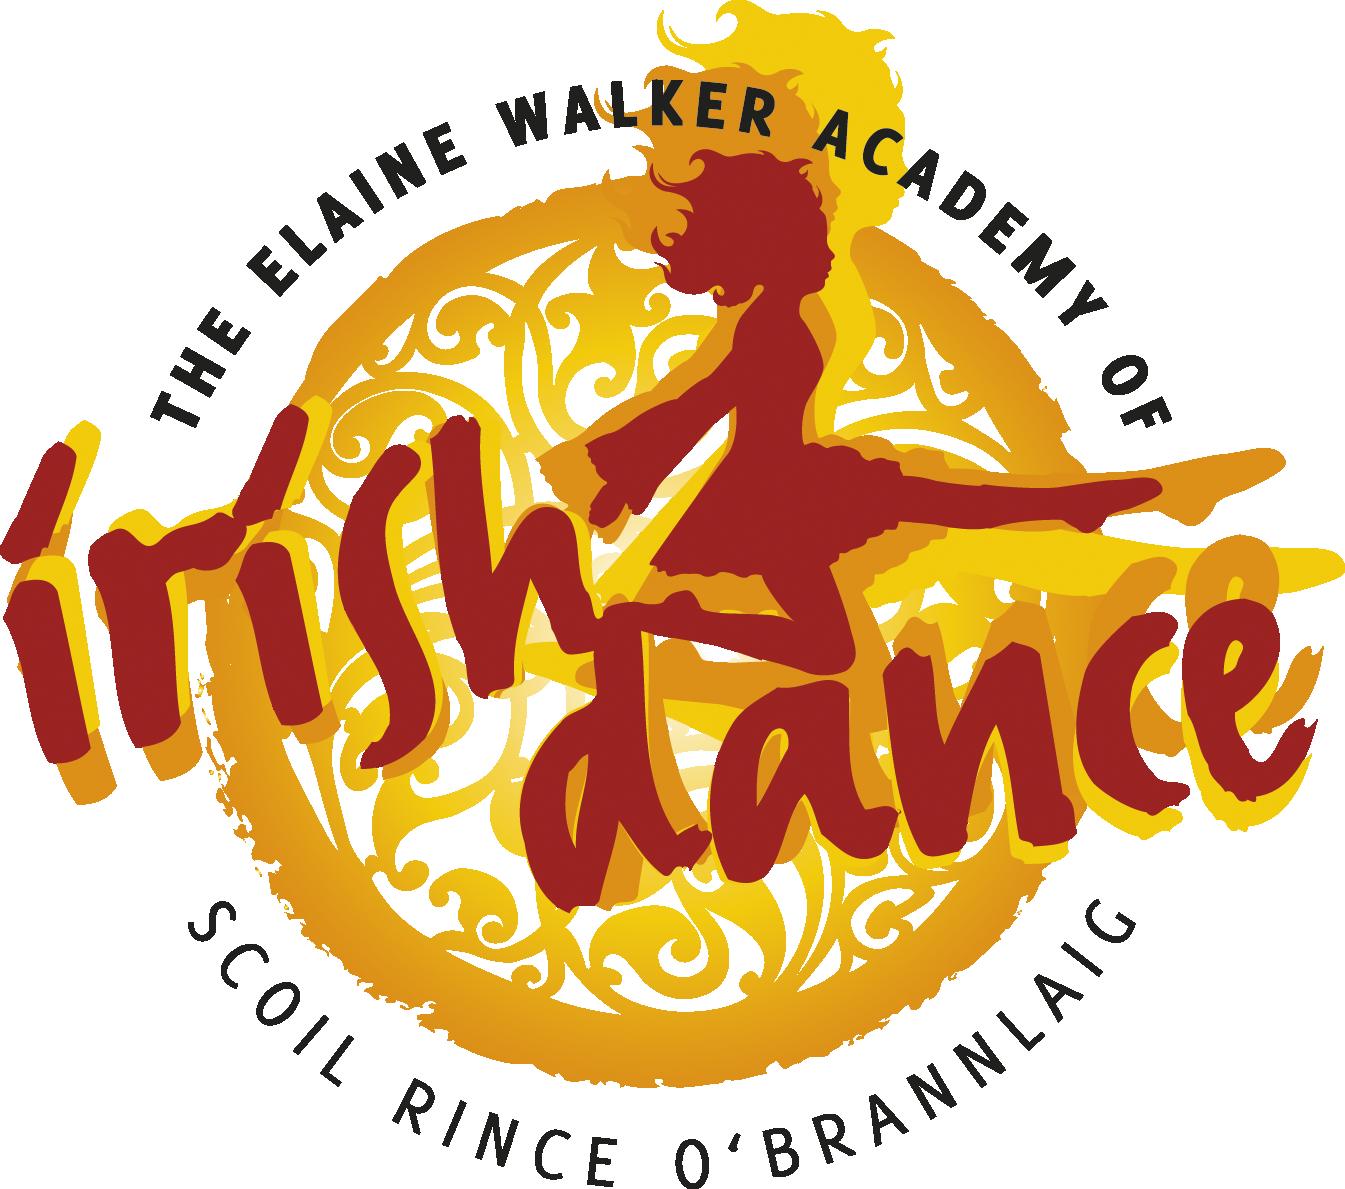 Walker-IrishDance-Logo-4c-pos